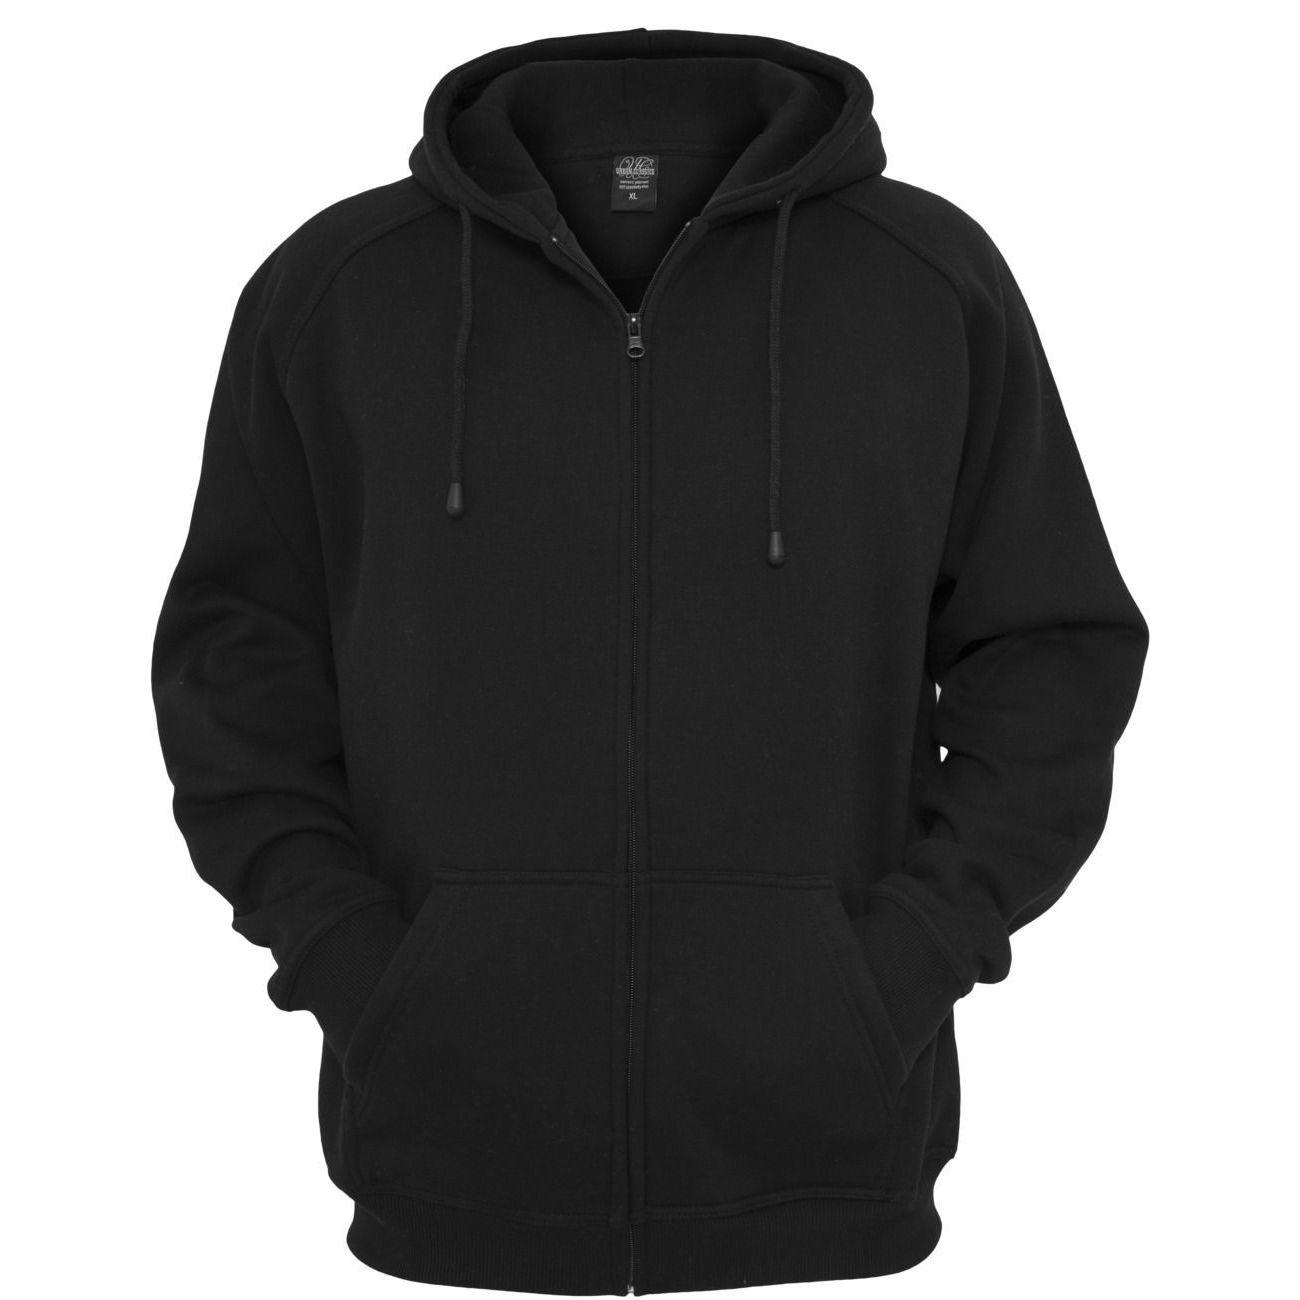 Mode Lifestyle adulte URBAN CLASSICS Sweat zippé URBAN CLASSICS large en molleton Noir